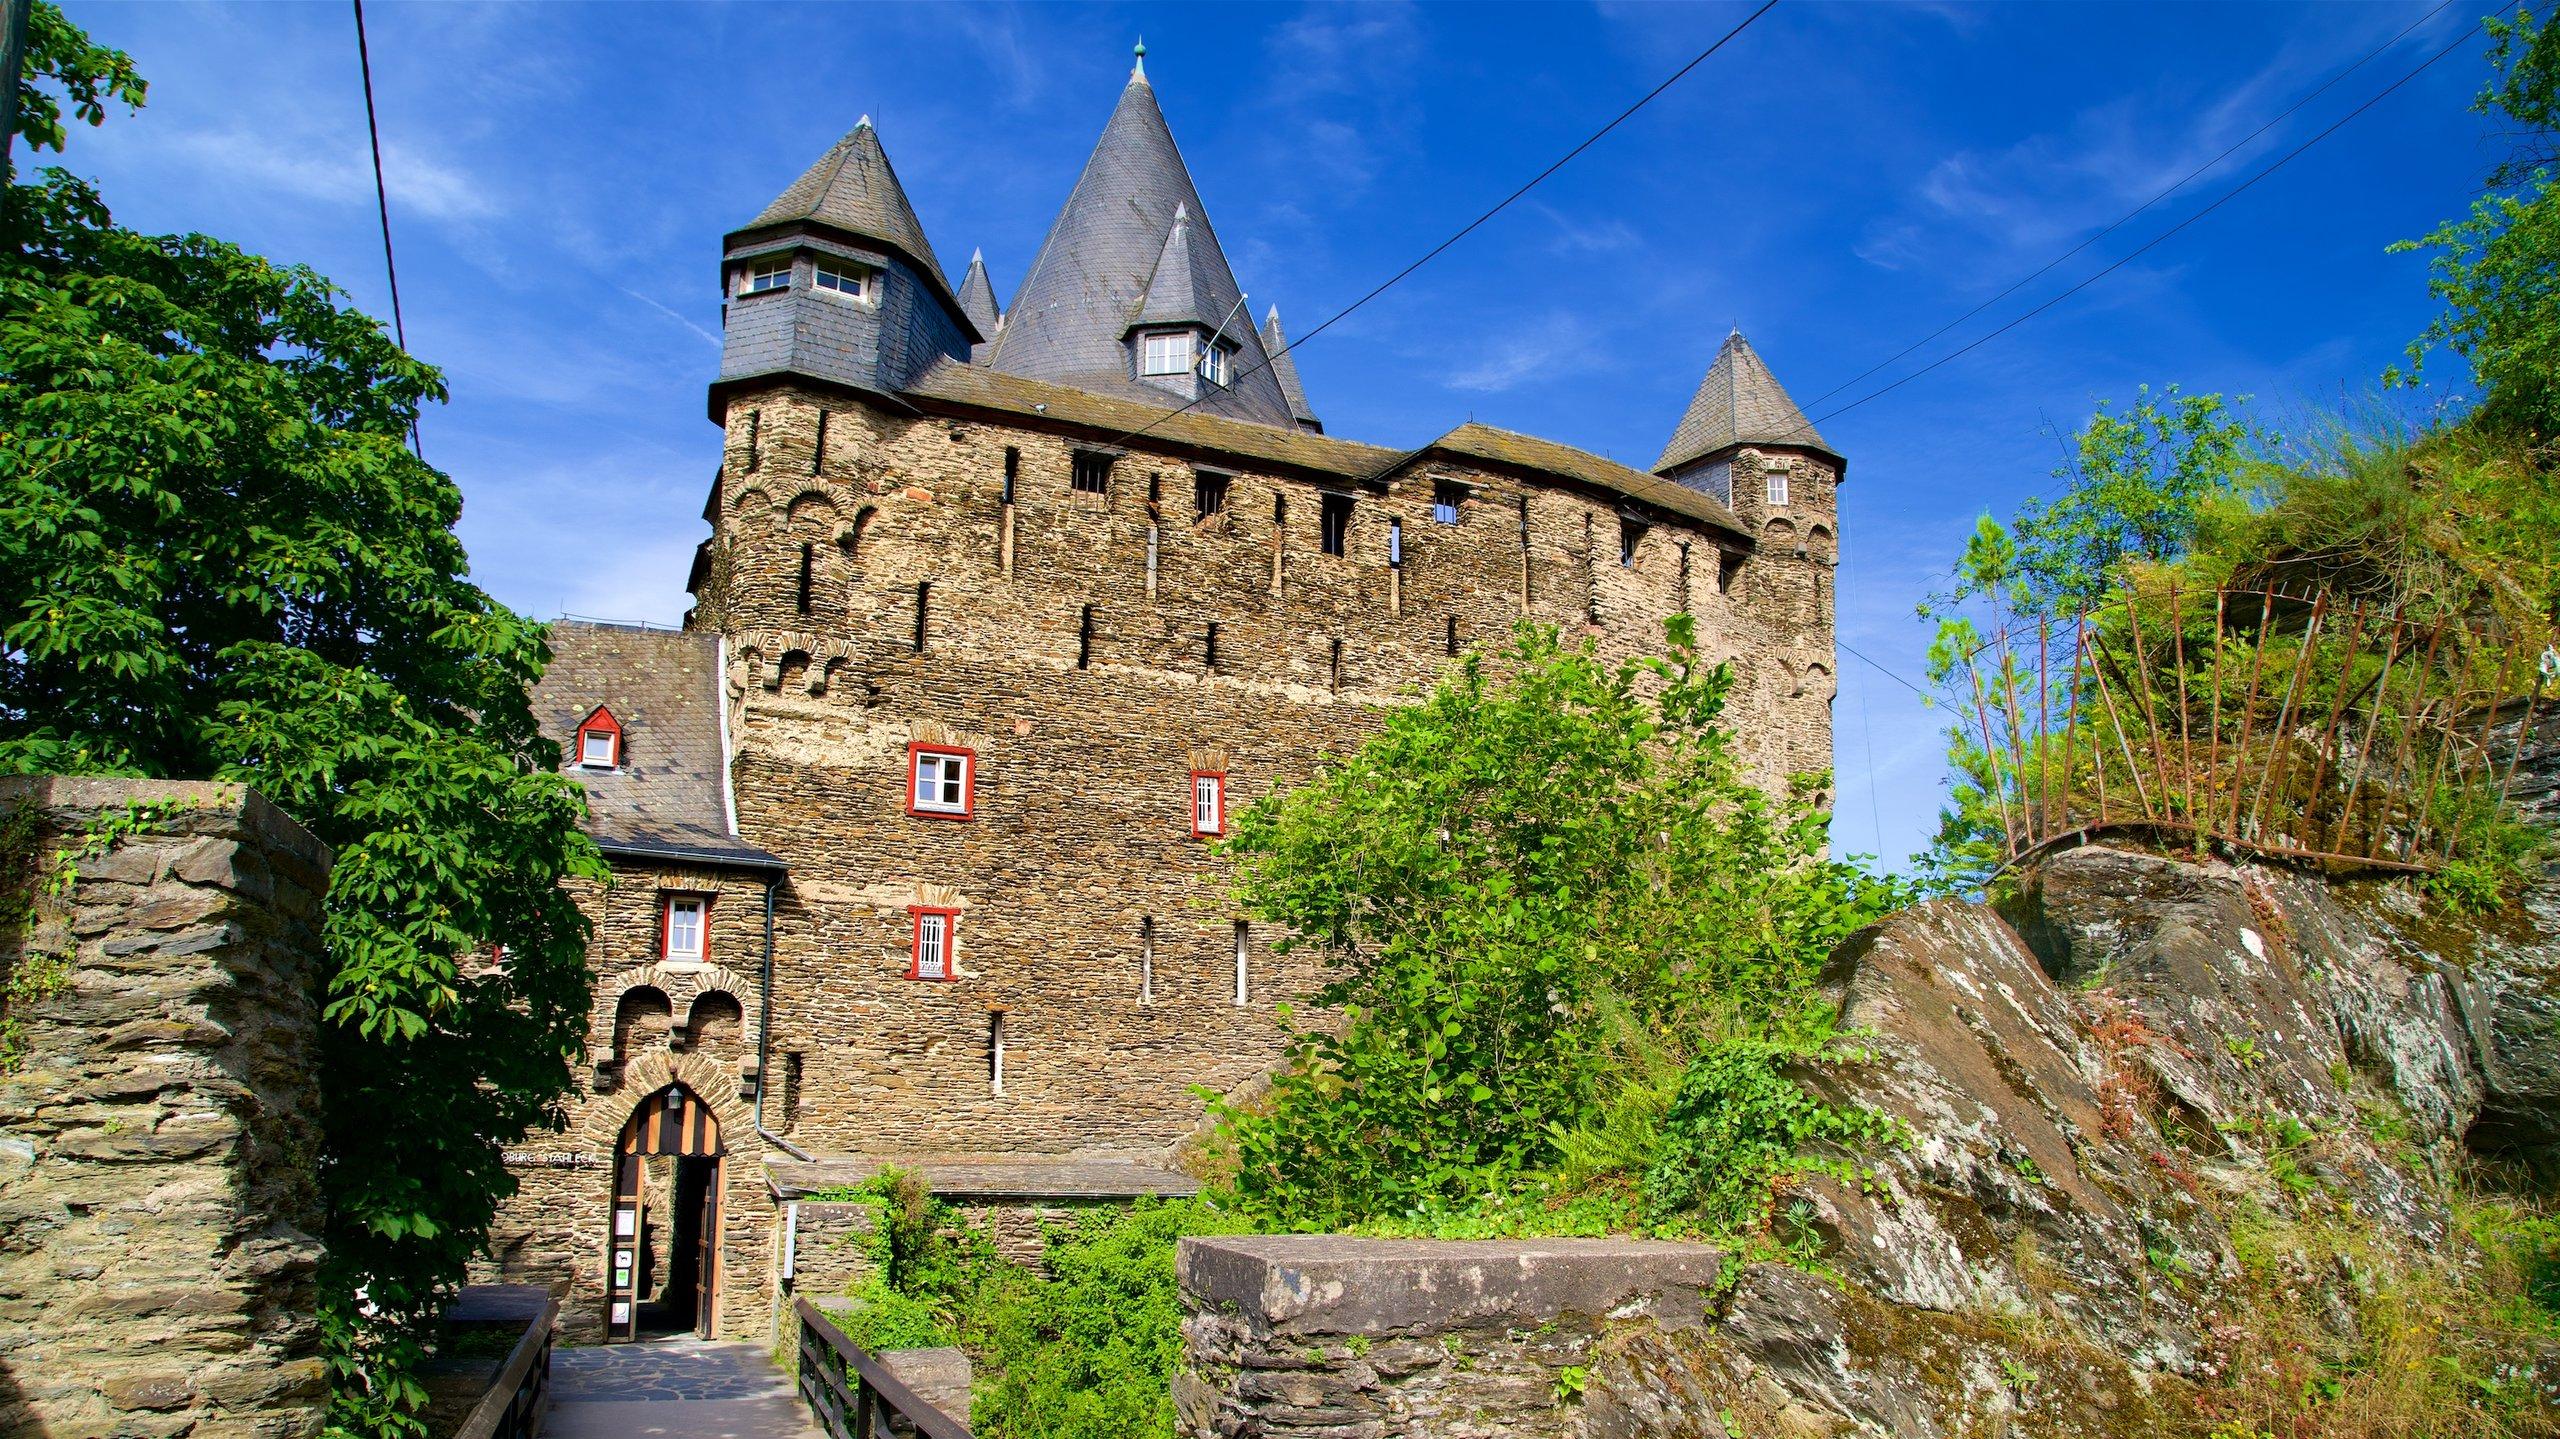 Stahleck Castle, Bacharach, Rhineland-Palatinate, Germany